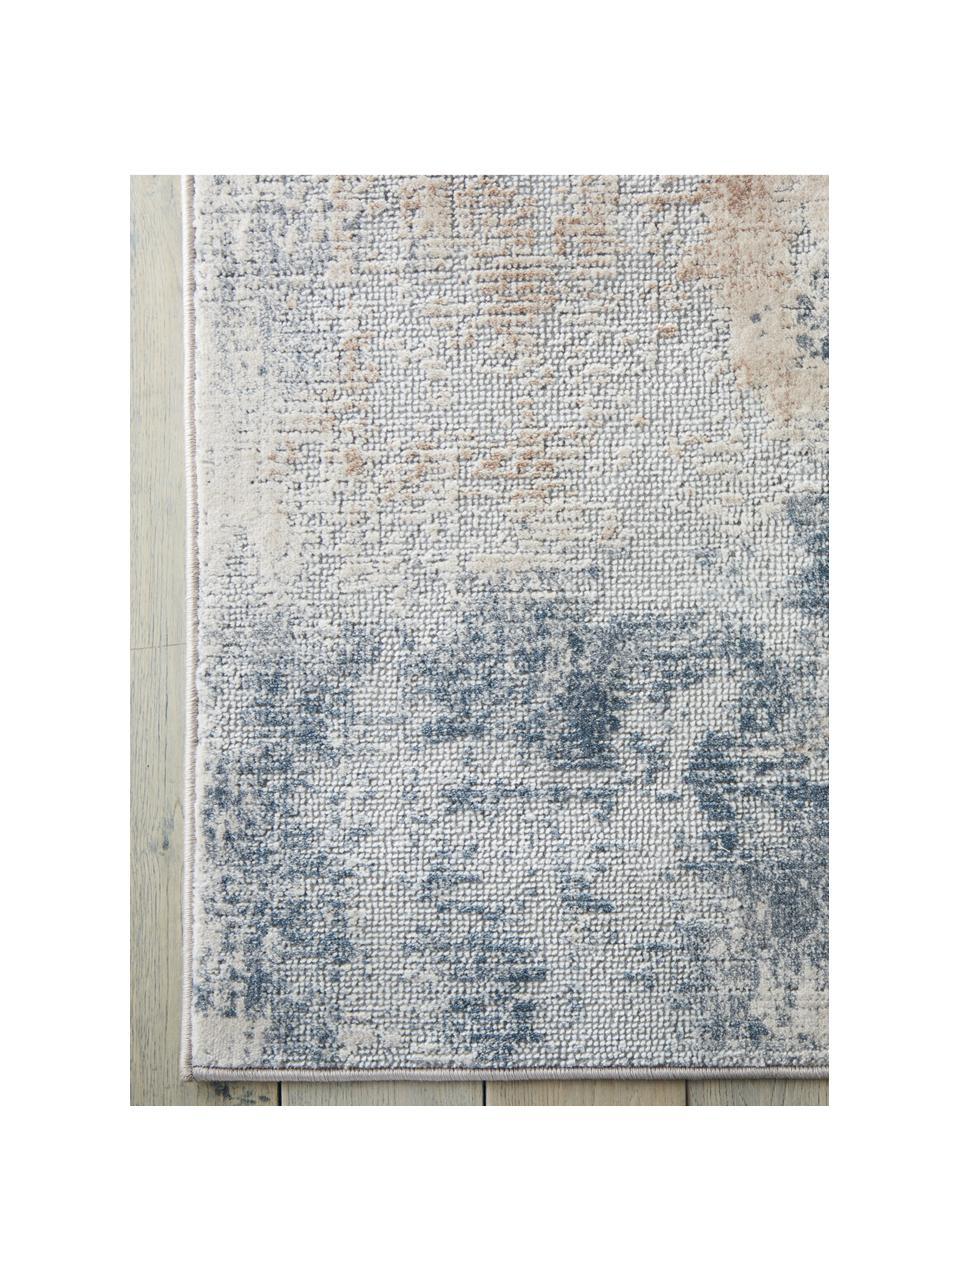 Tappeto di design beige/grigio Rustic Textures, Retro: 50%juta, 50%Latex, Tonalità beige, grigio, Larg. 160 x Lung. 220 cm (taglia M)